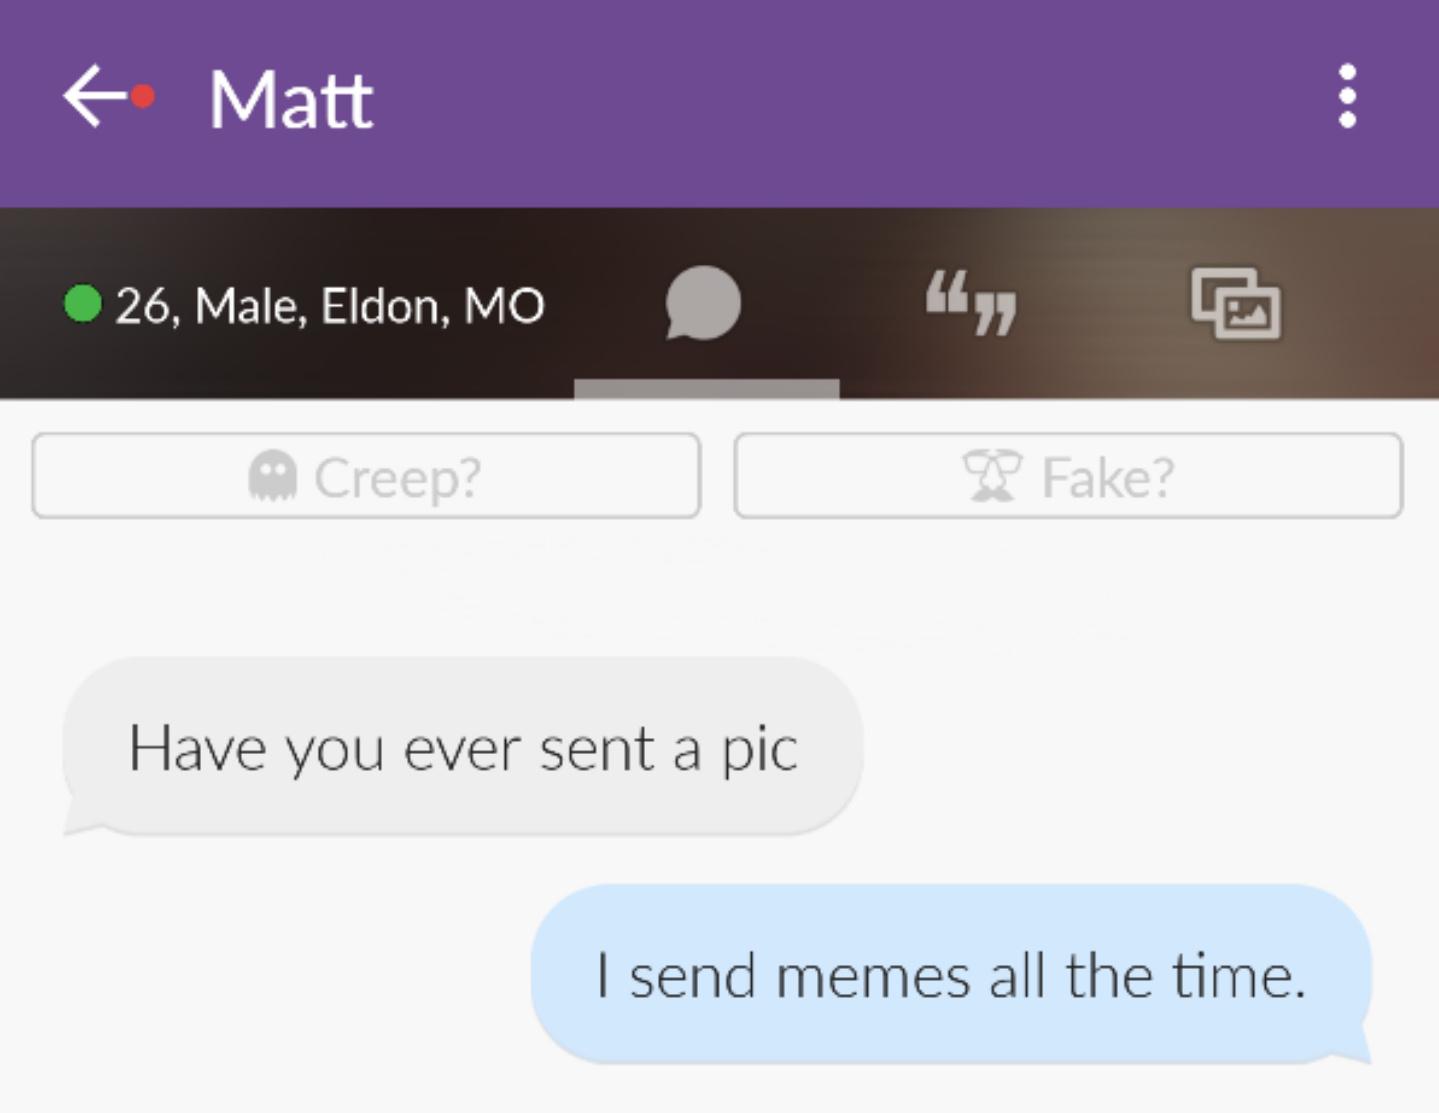 Guaranteed to get you laid. - meme